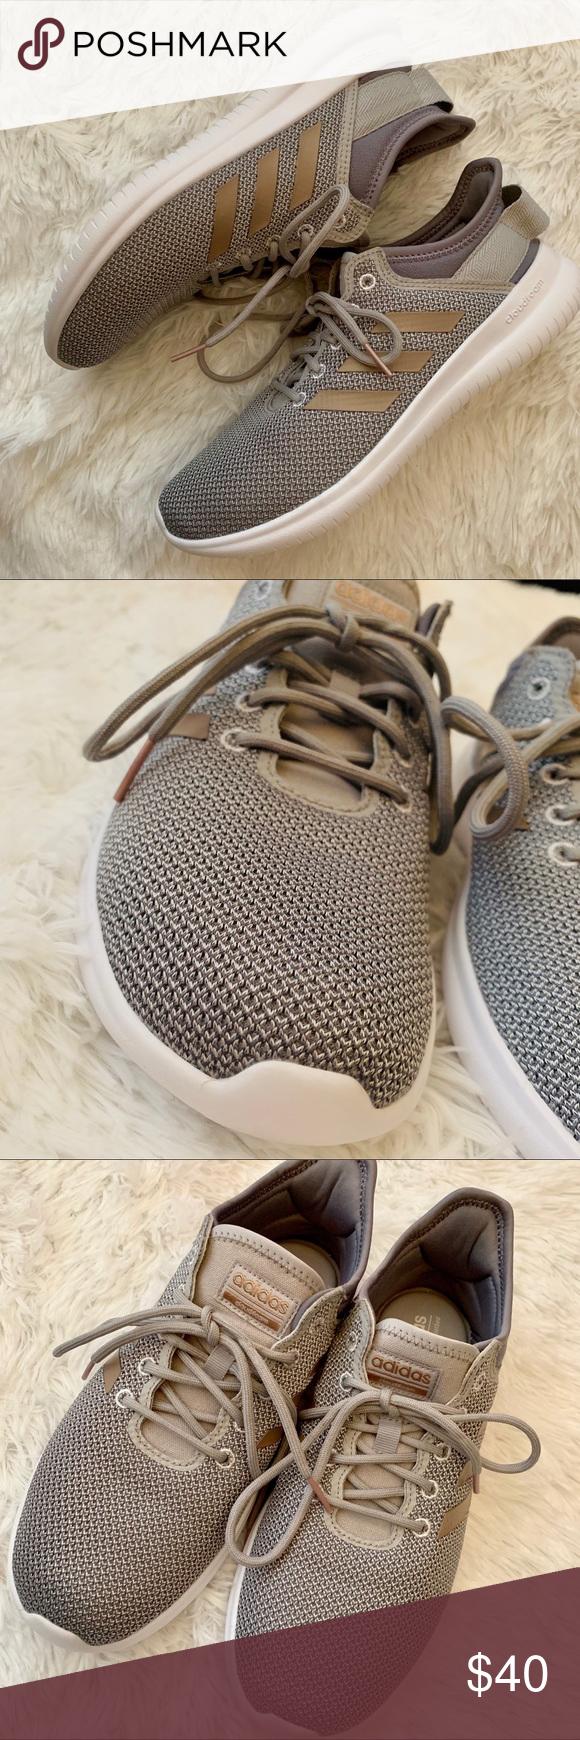 Adidas Cloudfoam Shoes. Size 8.5